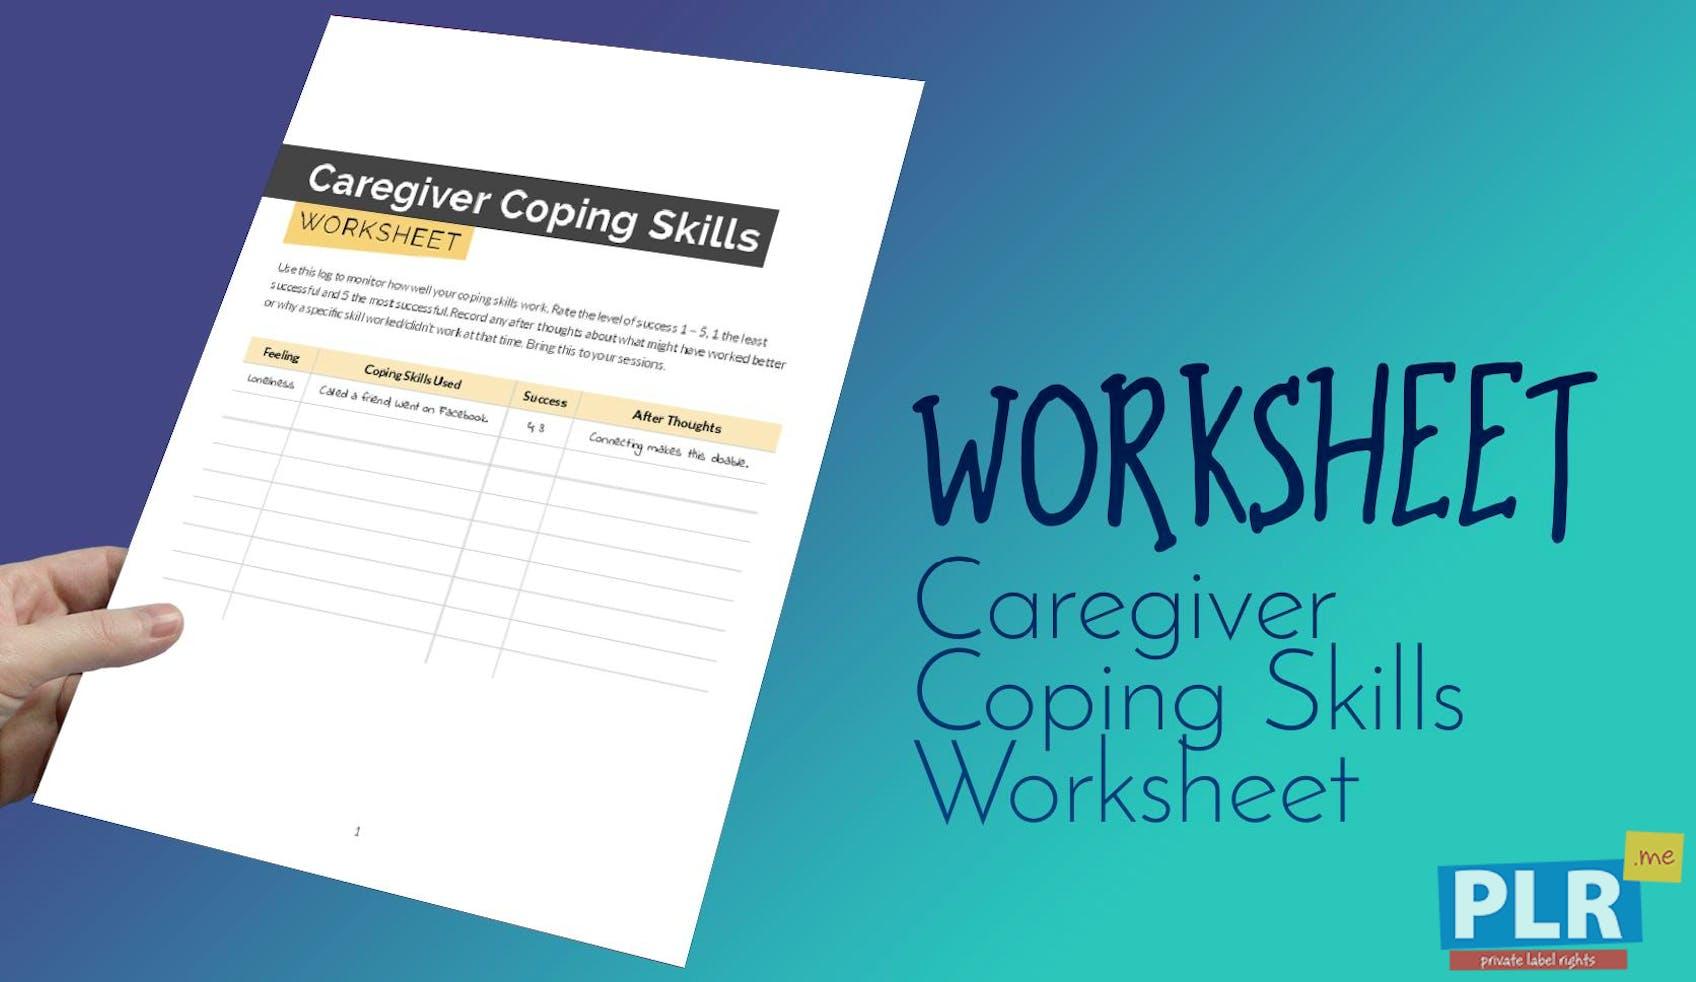 Caregiver Coping Skills Worksheet